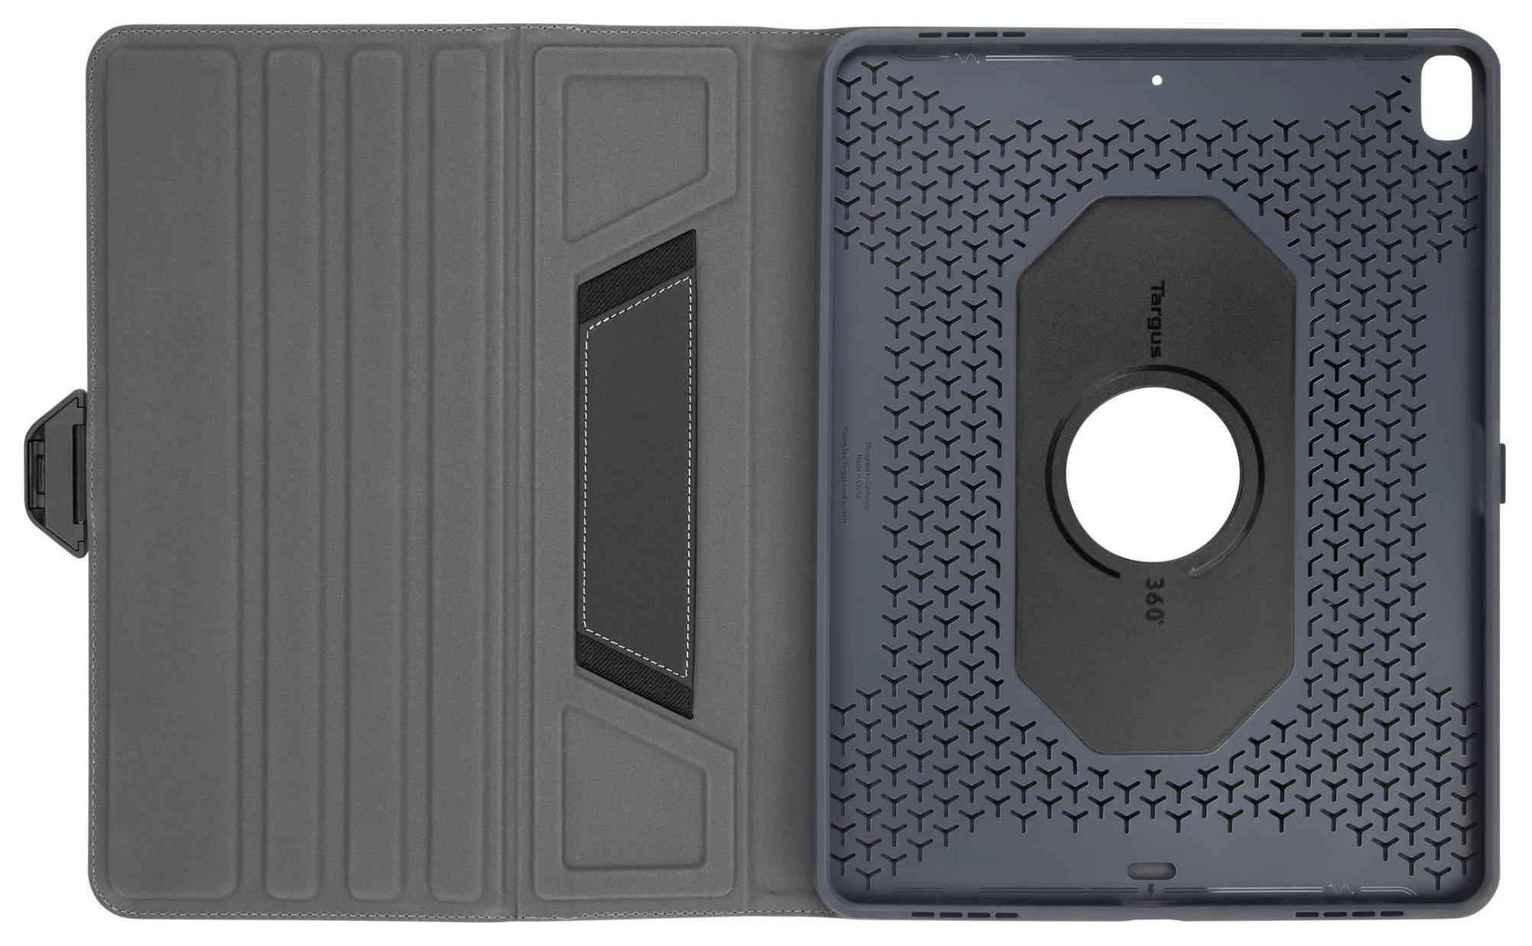 Targus VersaVu iPad Pro 12.9 Inch Tablet Case - Black